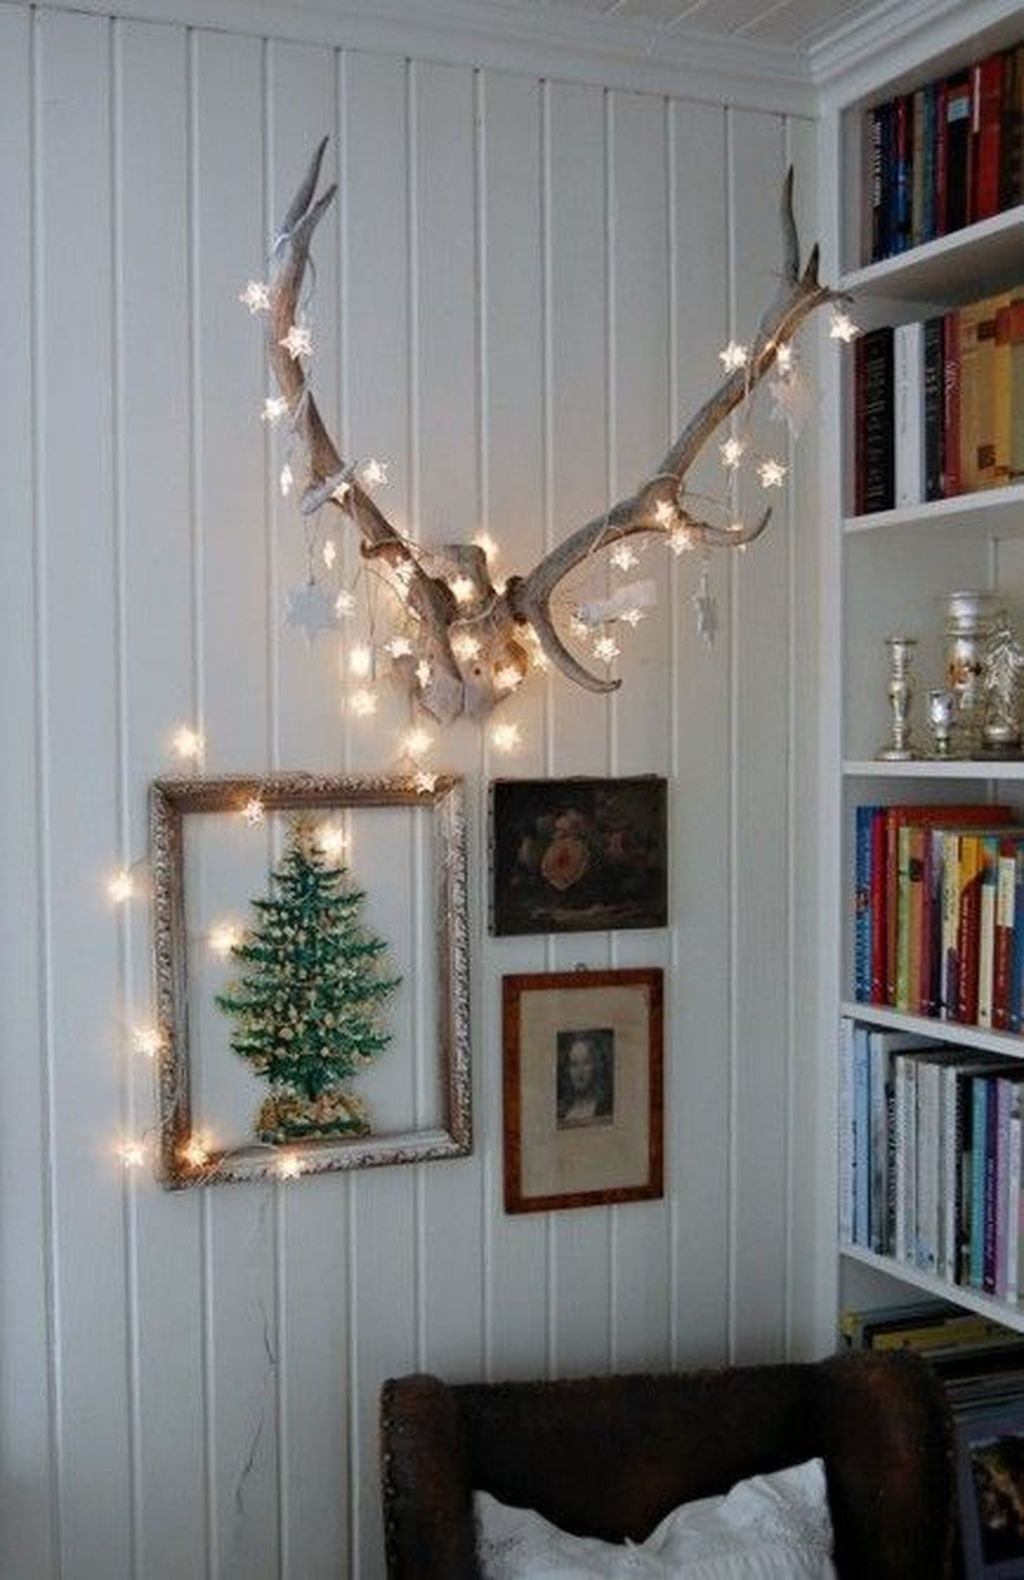 Splendid Deer Shelf Design Ideas With Minimalist Scandinavian Style To Try 32